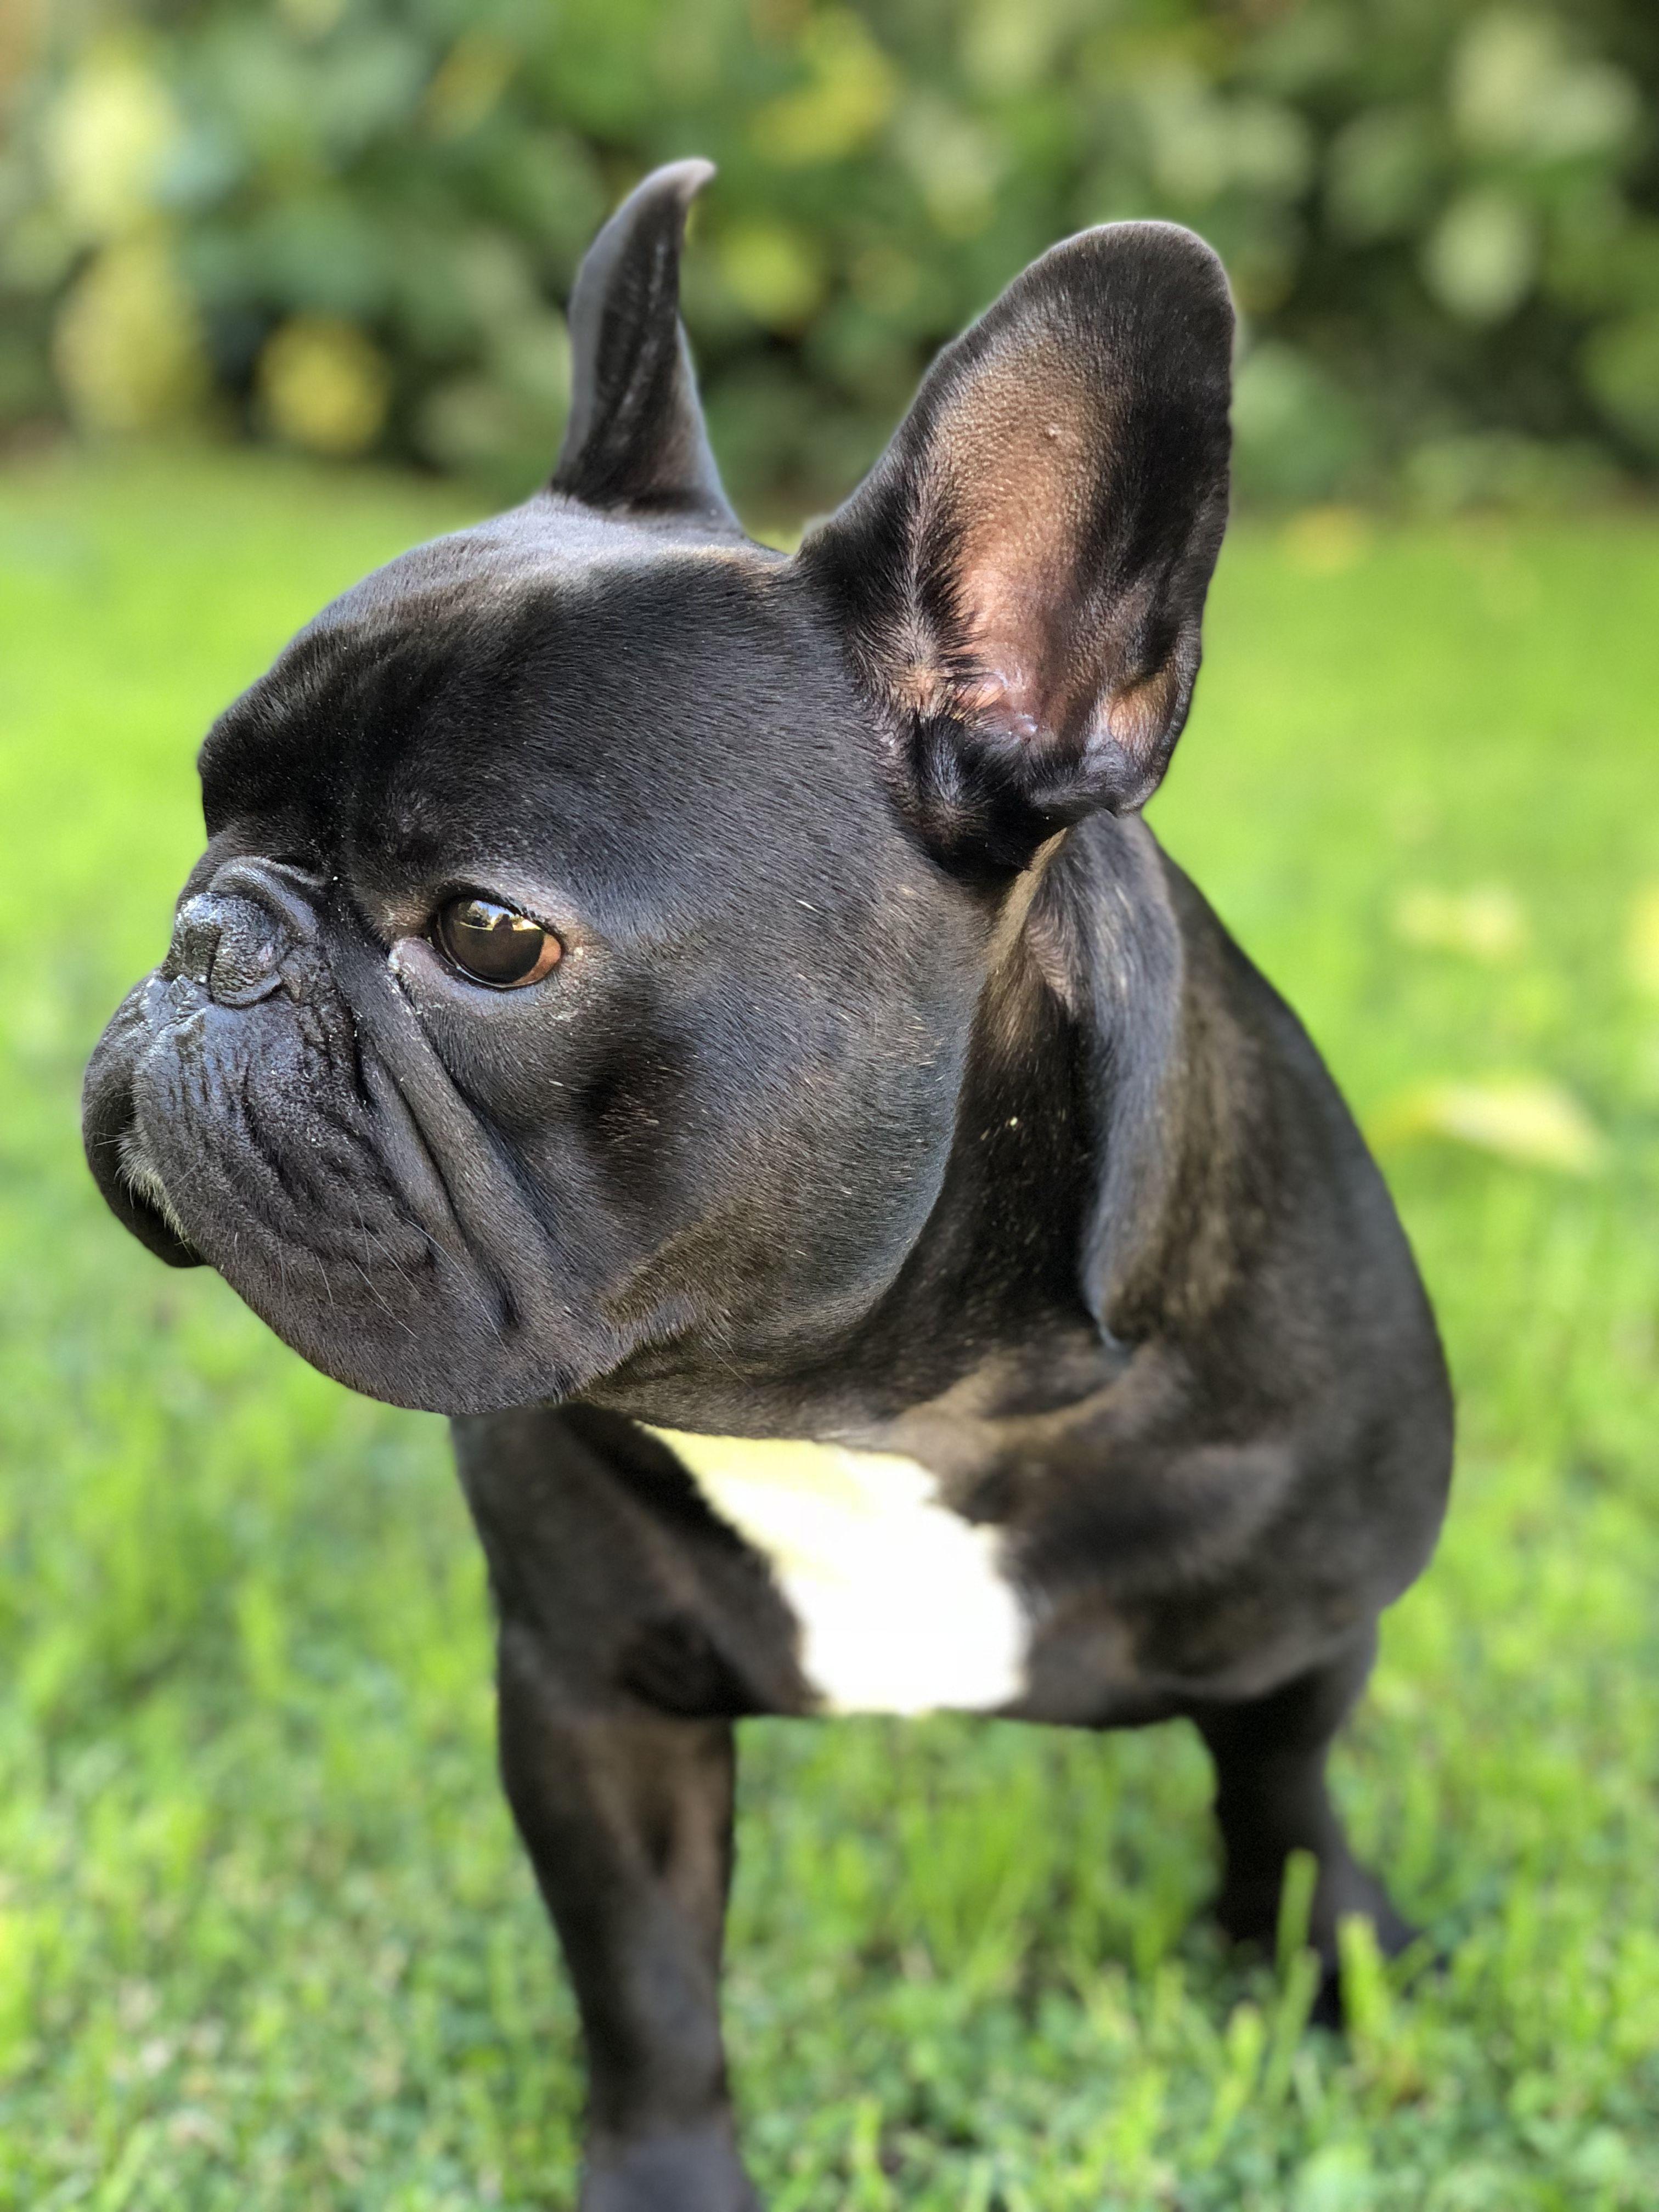 French bulldog cute animals bulldog